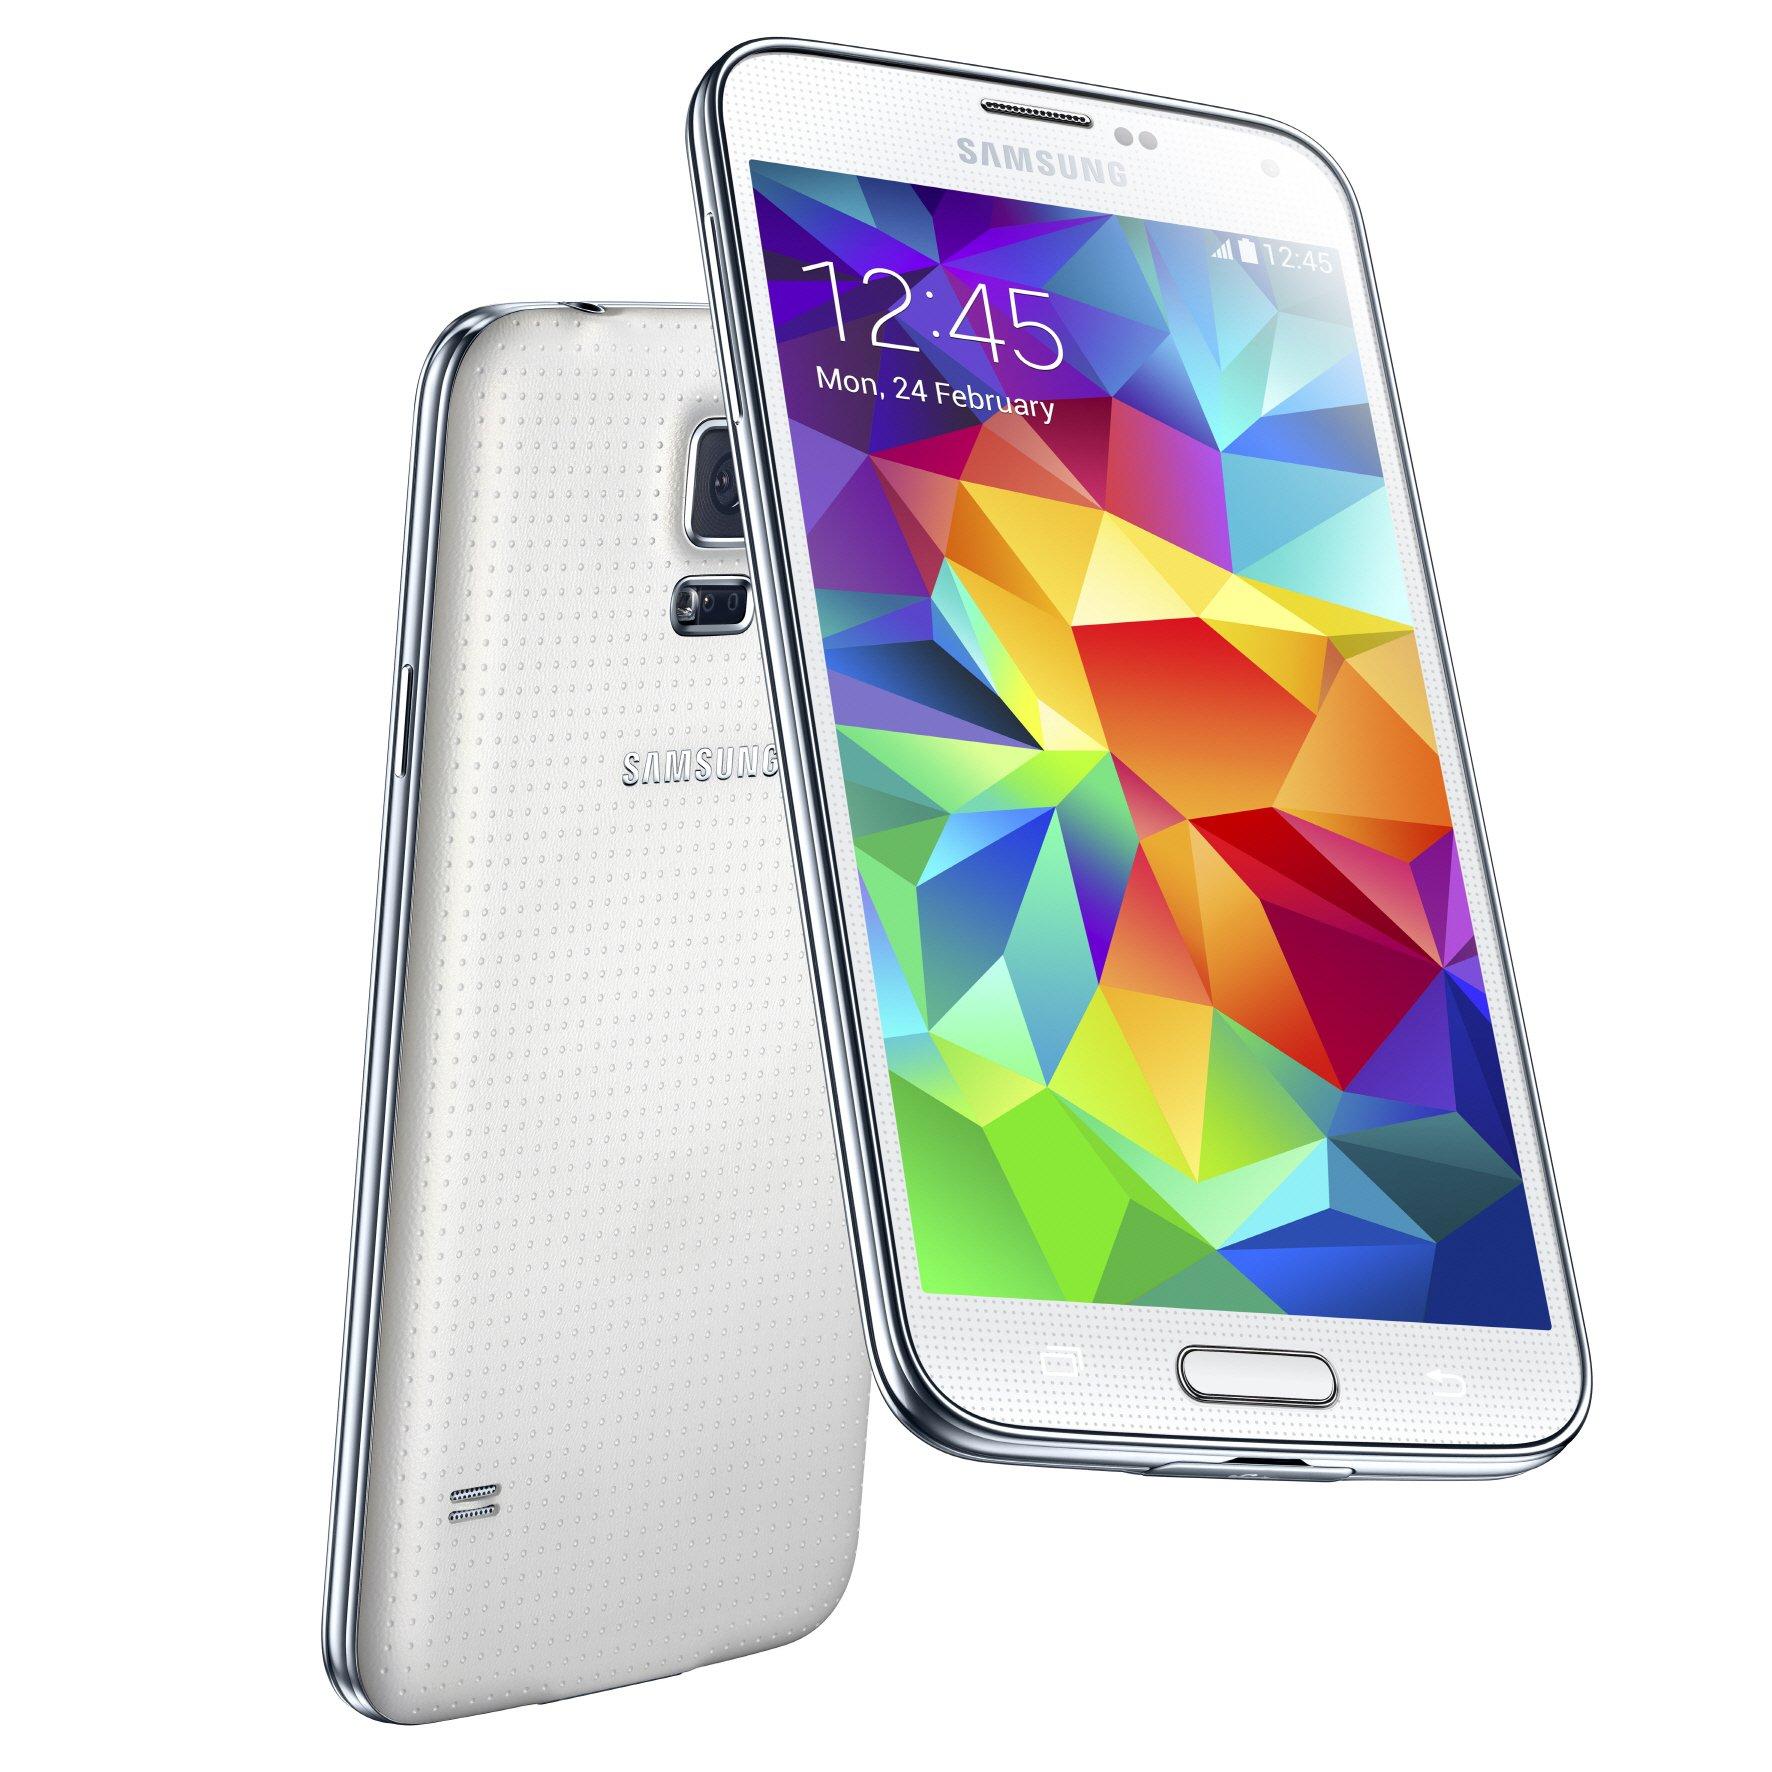 Samsung legújabb okostelefonja, a Galaxy S5